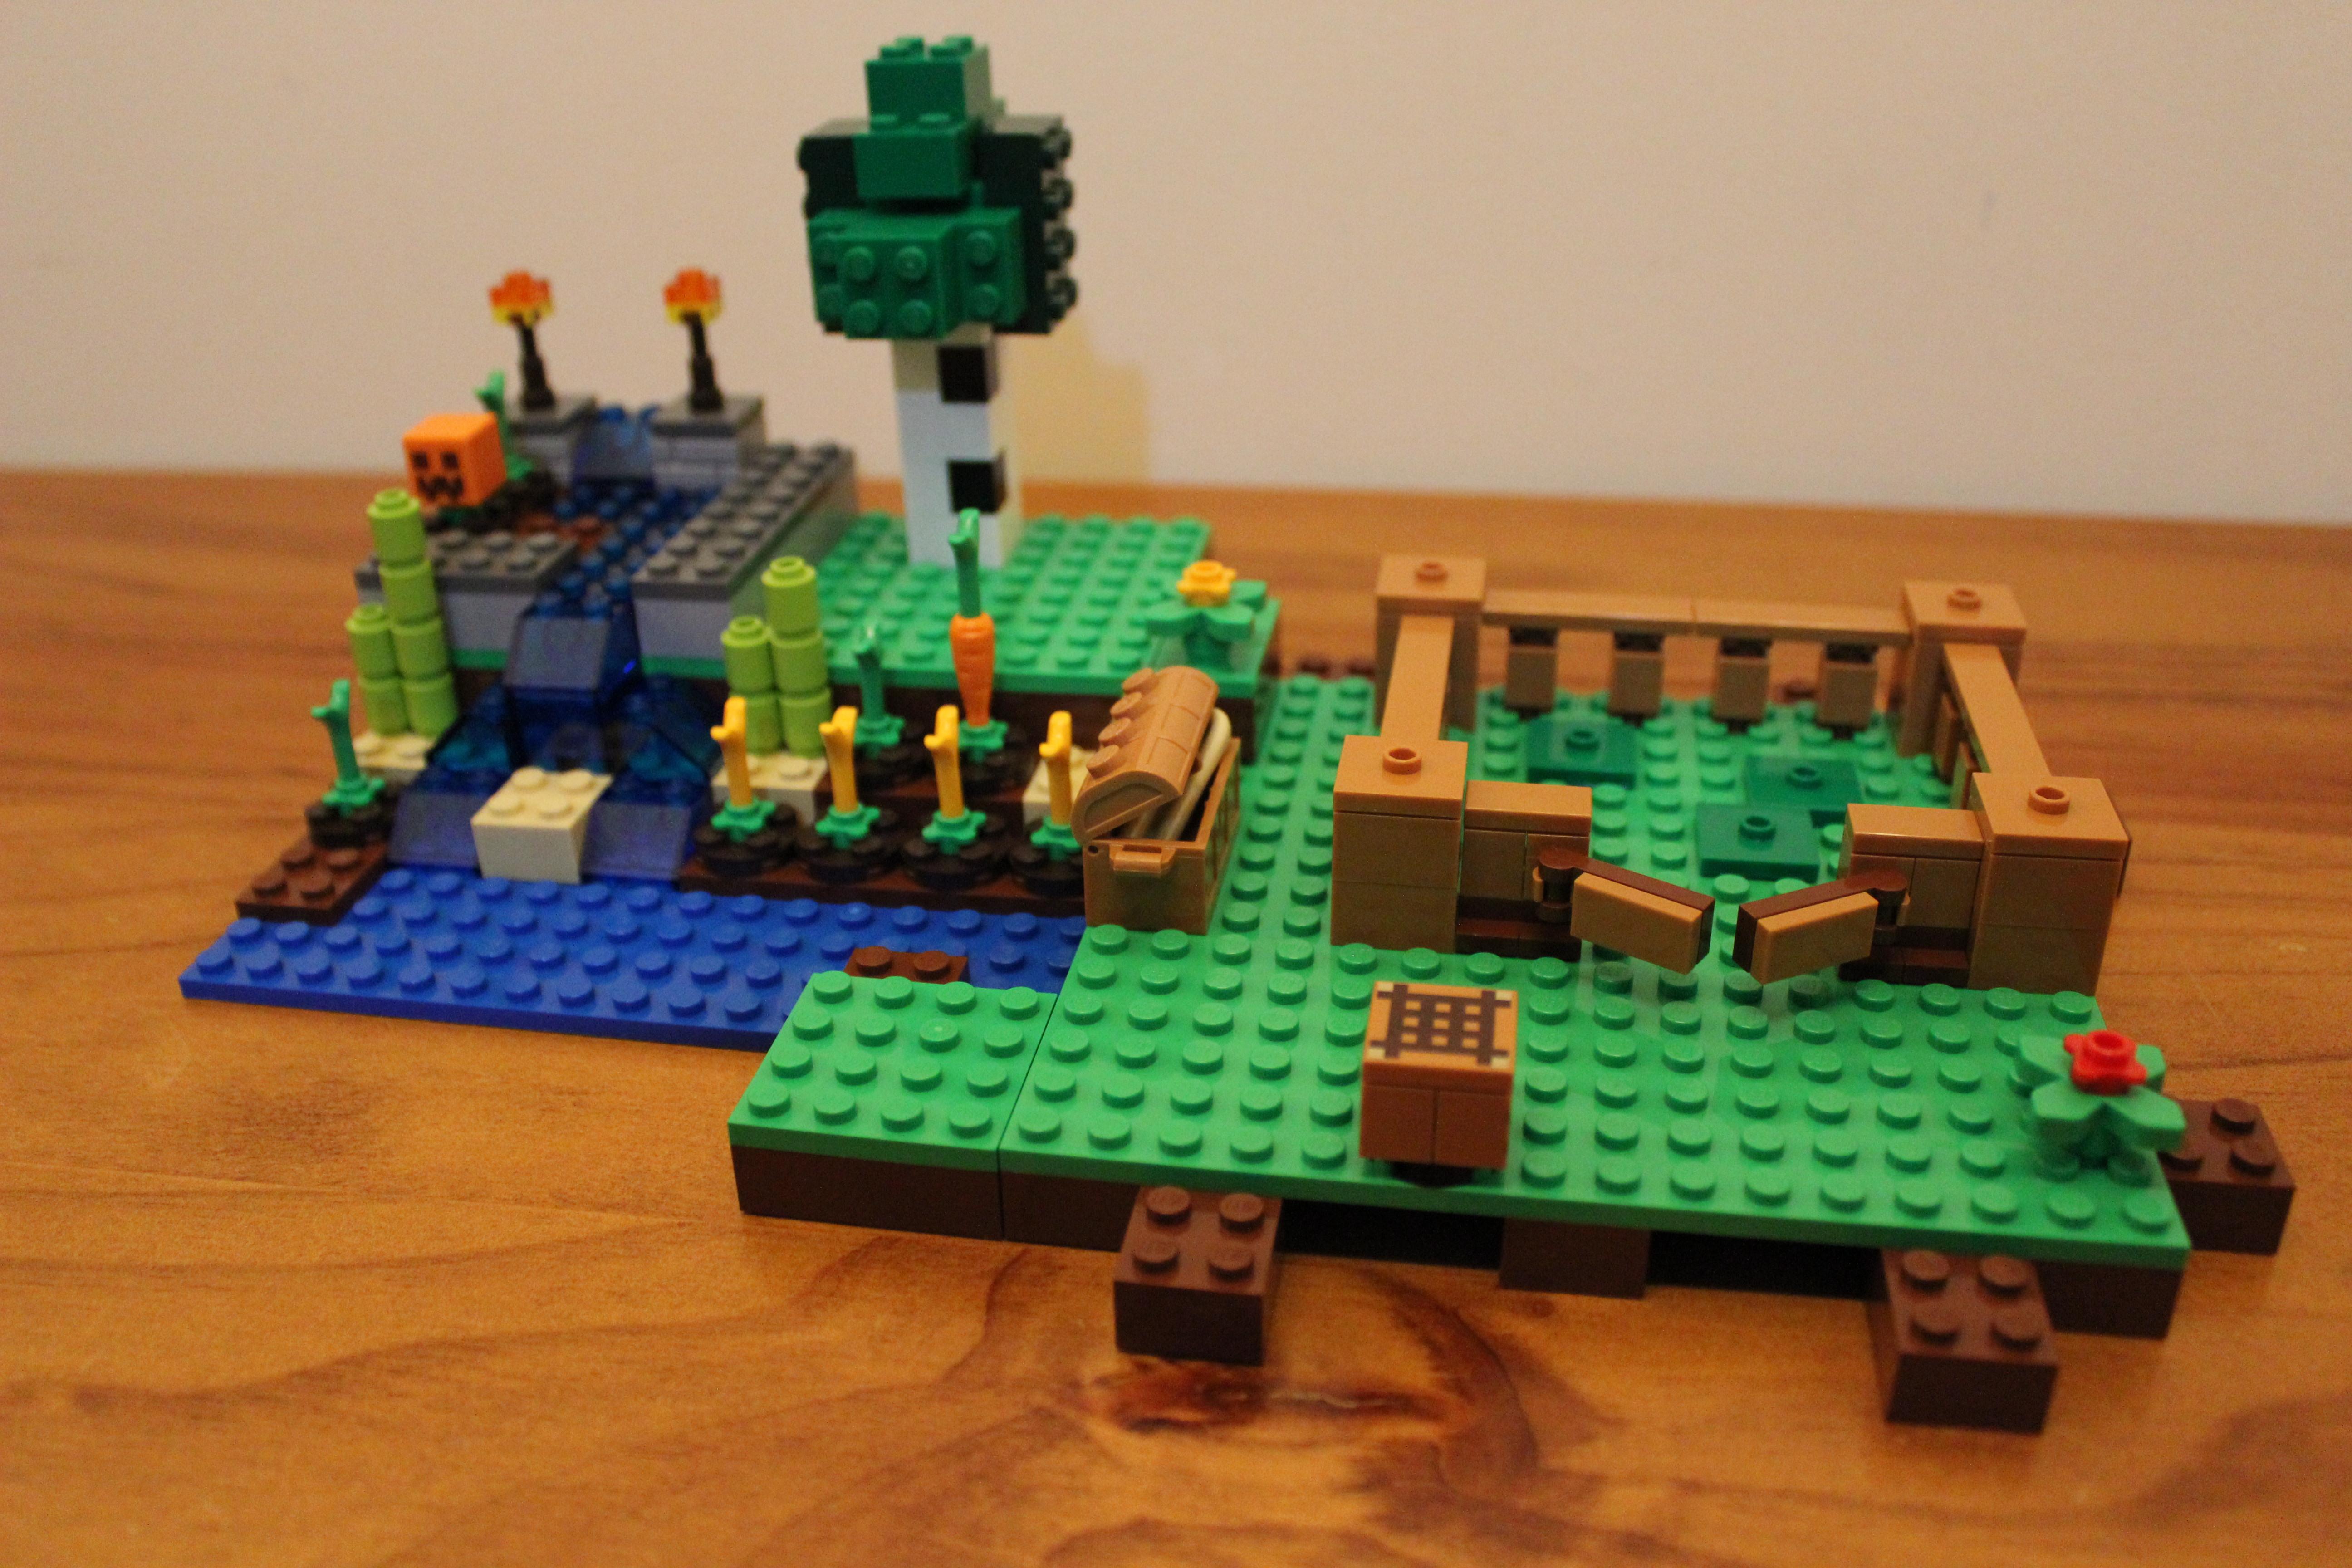 Lego Minecraft The Farm 21114 Review Truthfulnerd